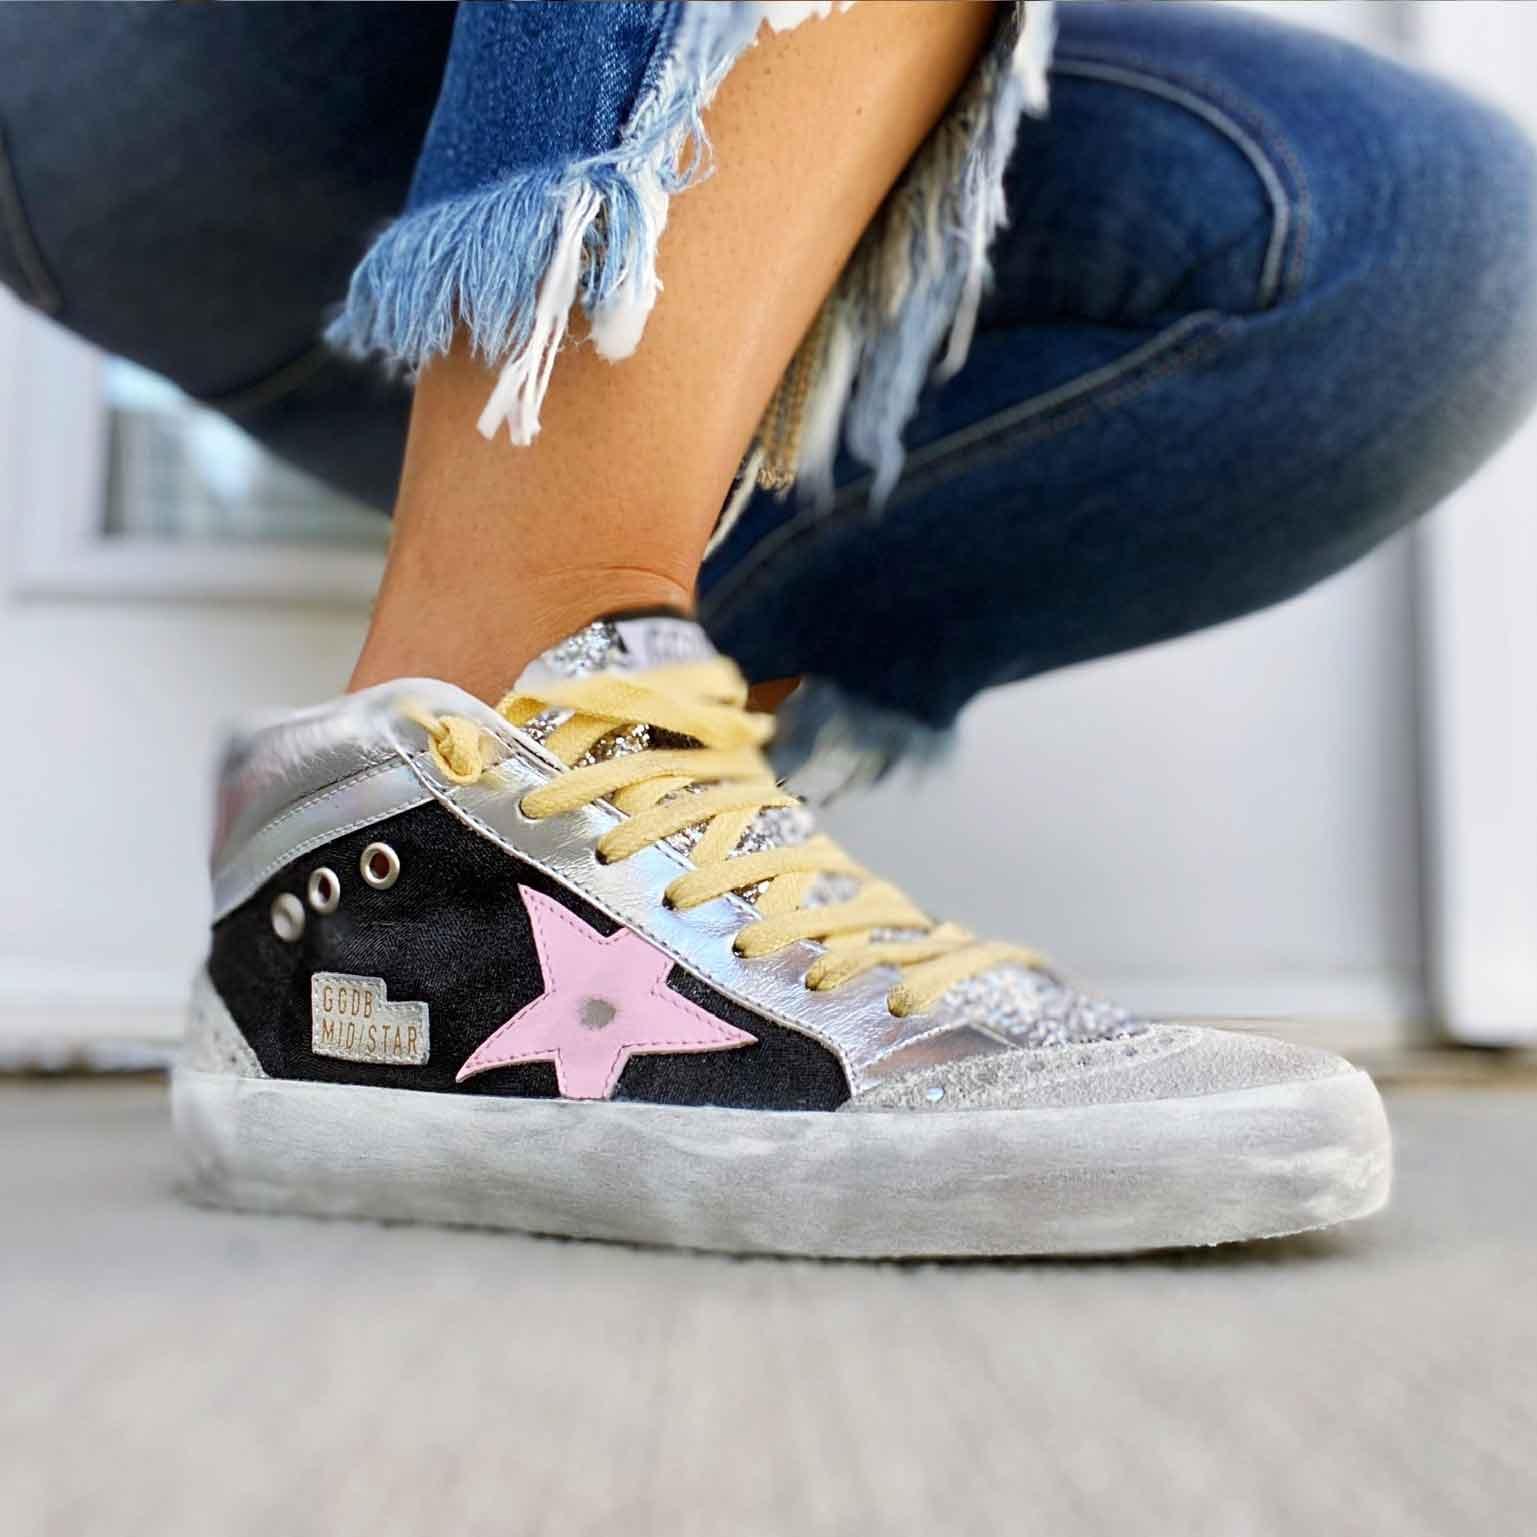 Golden Goose - Midstar Glitter High Top Sneaker